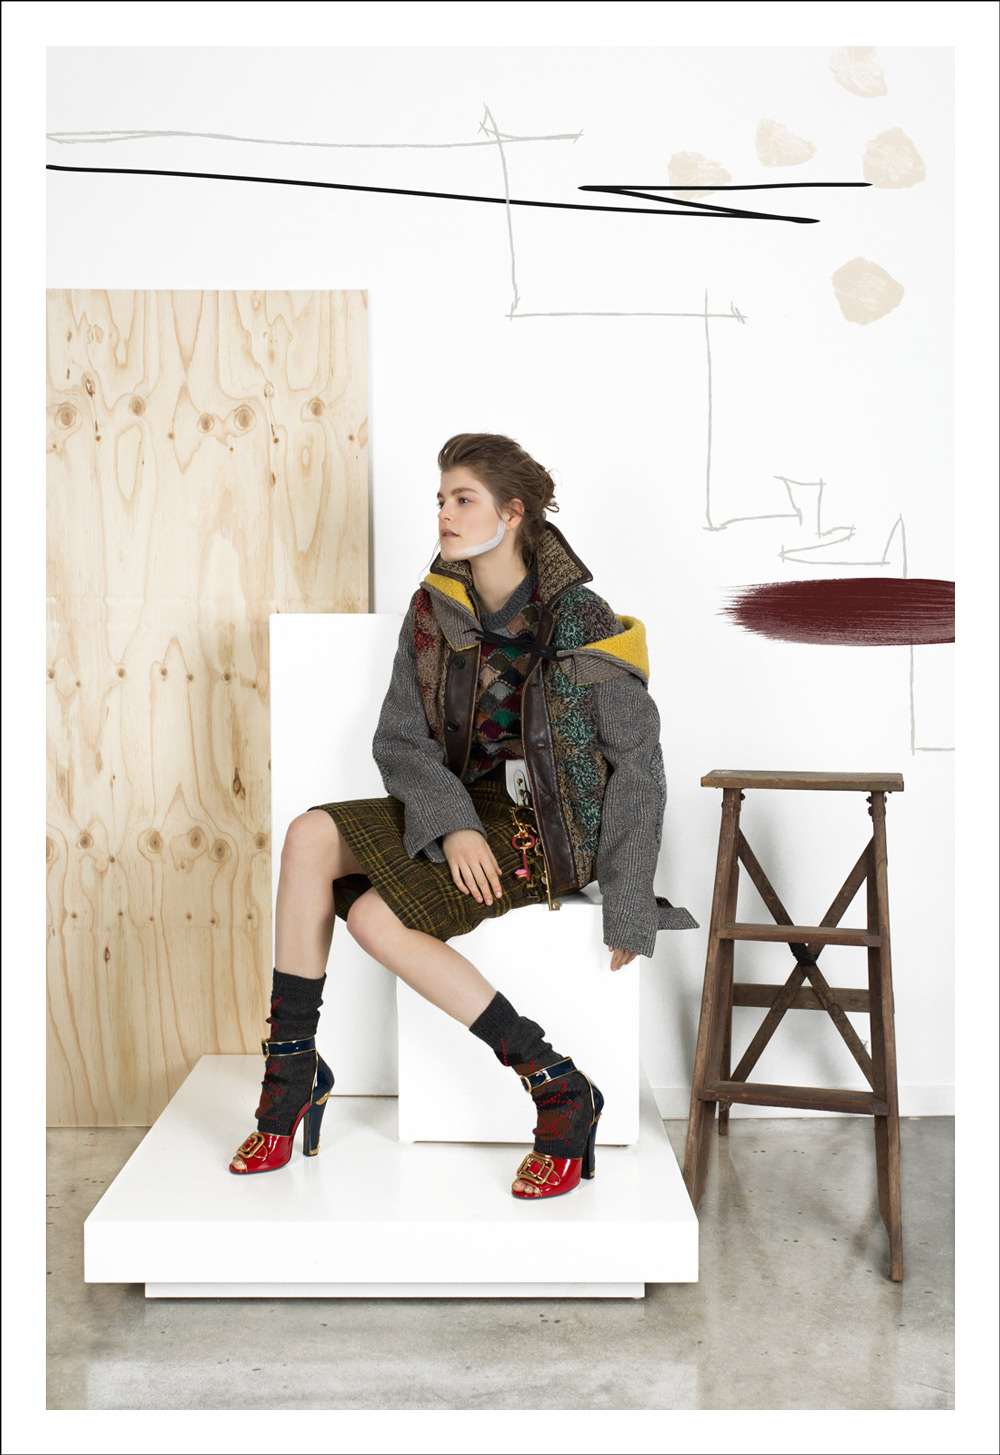 Prada, autumn winter, 2016, accessories, bag, prada bag, prada shoes, prada stores, campaign, photography, styling, amanda shadforth, oracle fox